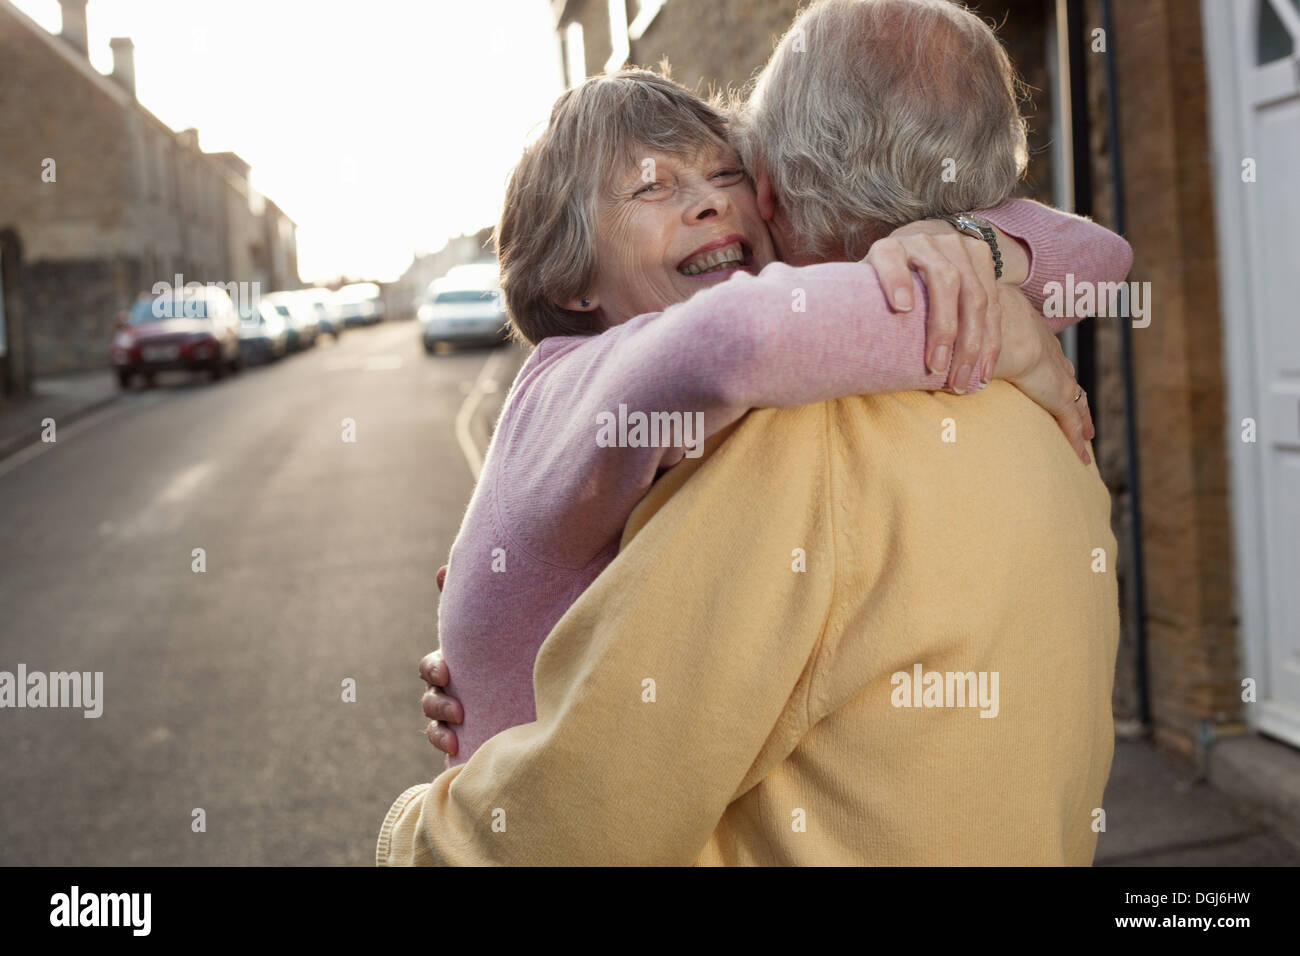 Mari et femme serrant amoureusement sur street Photo Stock